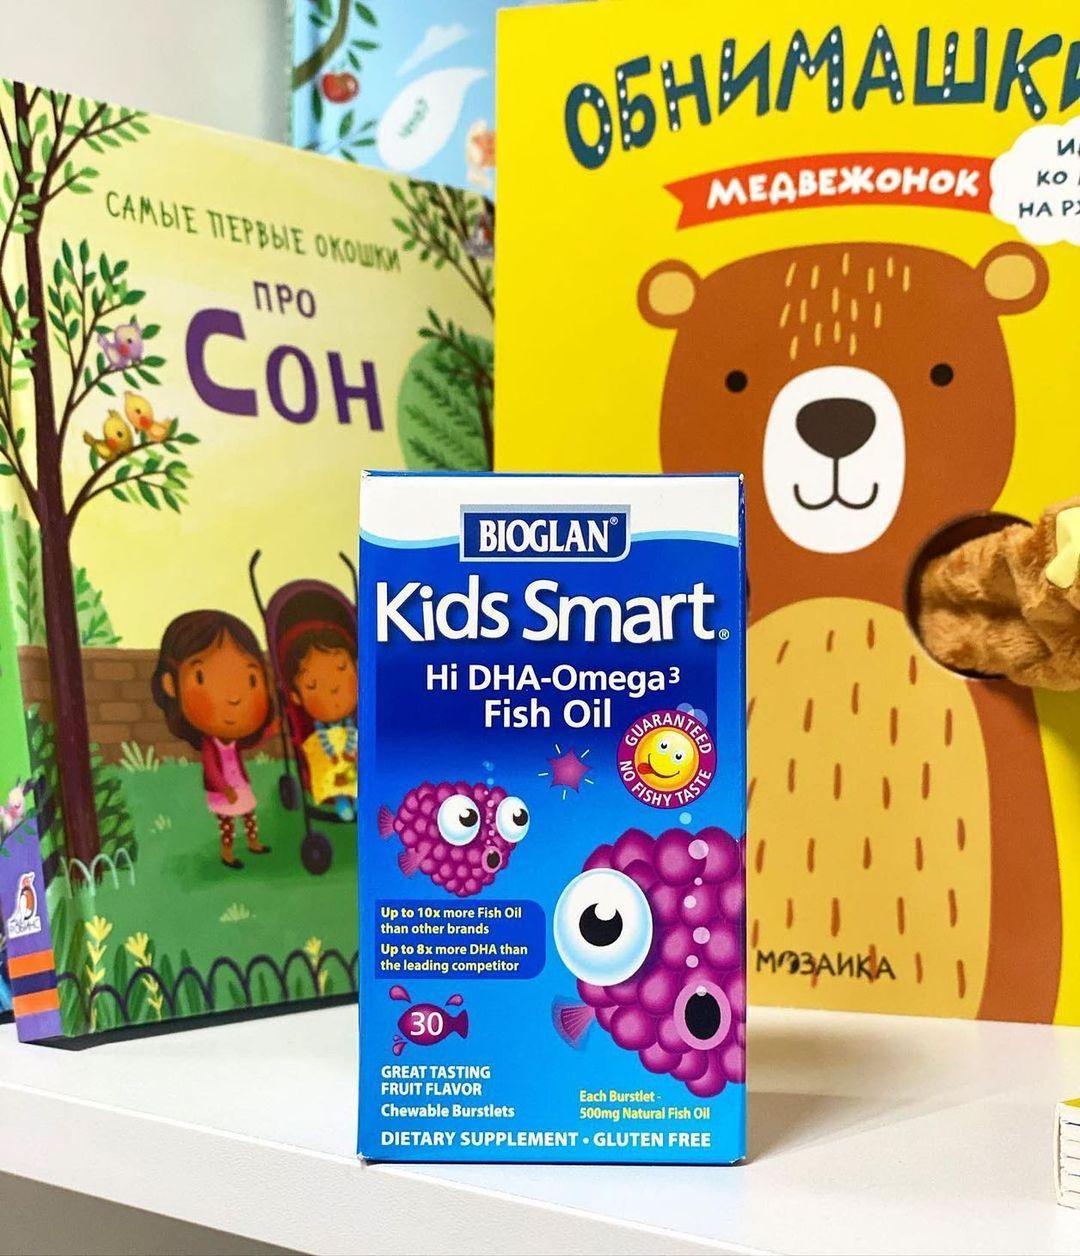 BIoglan, Kids Smart, Omega 3, Fish Oil, 500mg, 30 капсул